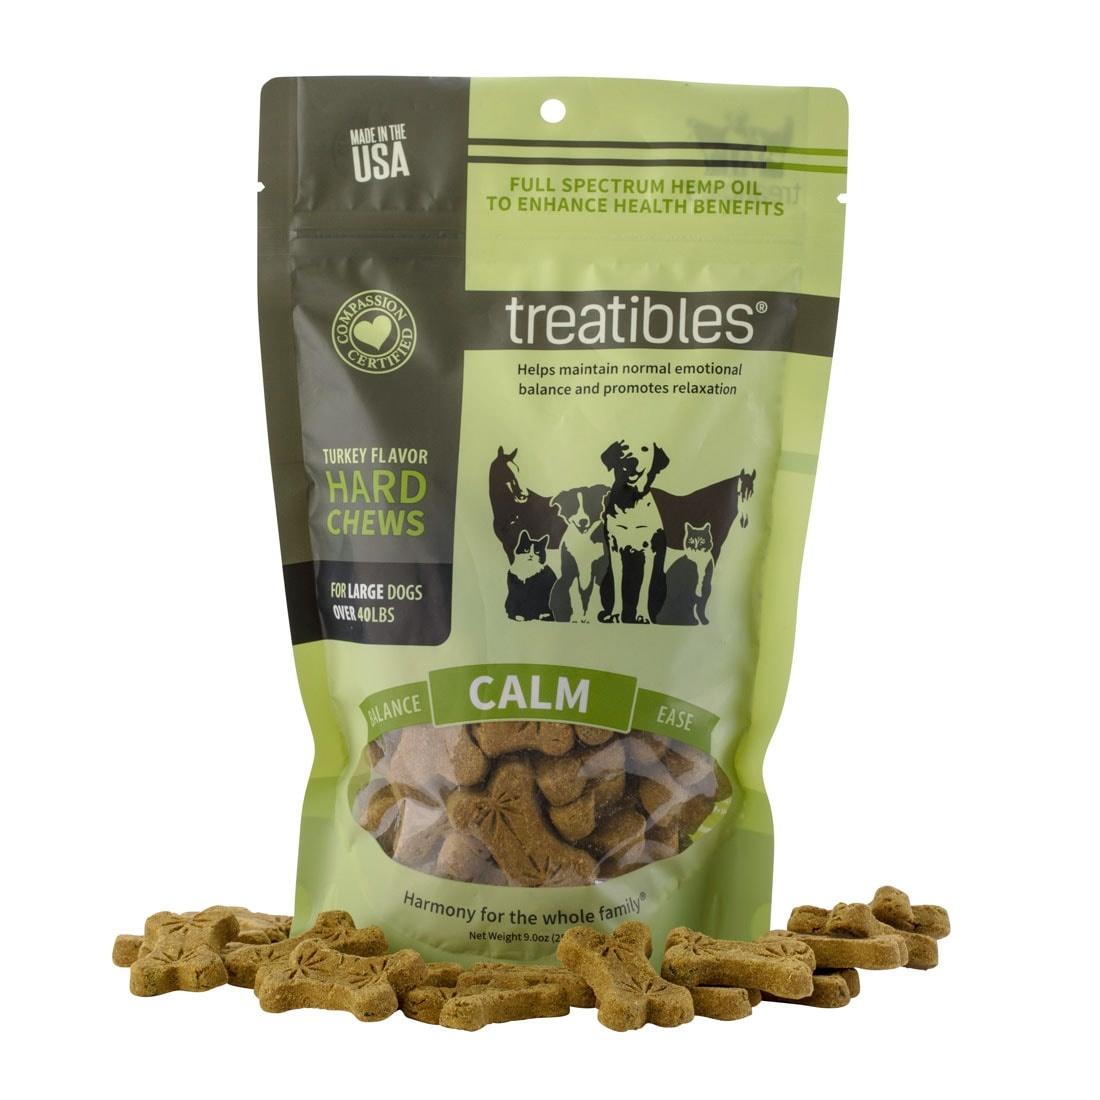 Treatibles Treatibles Hard Chews Intro - 1oz Sml/Med Turkey